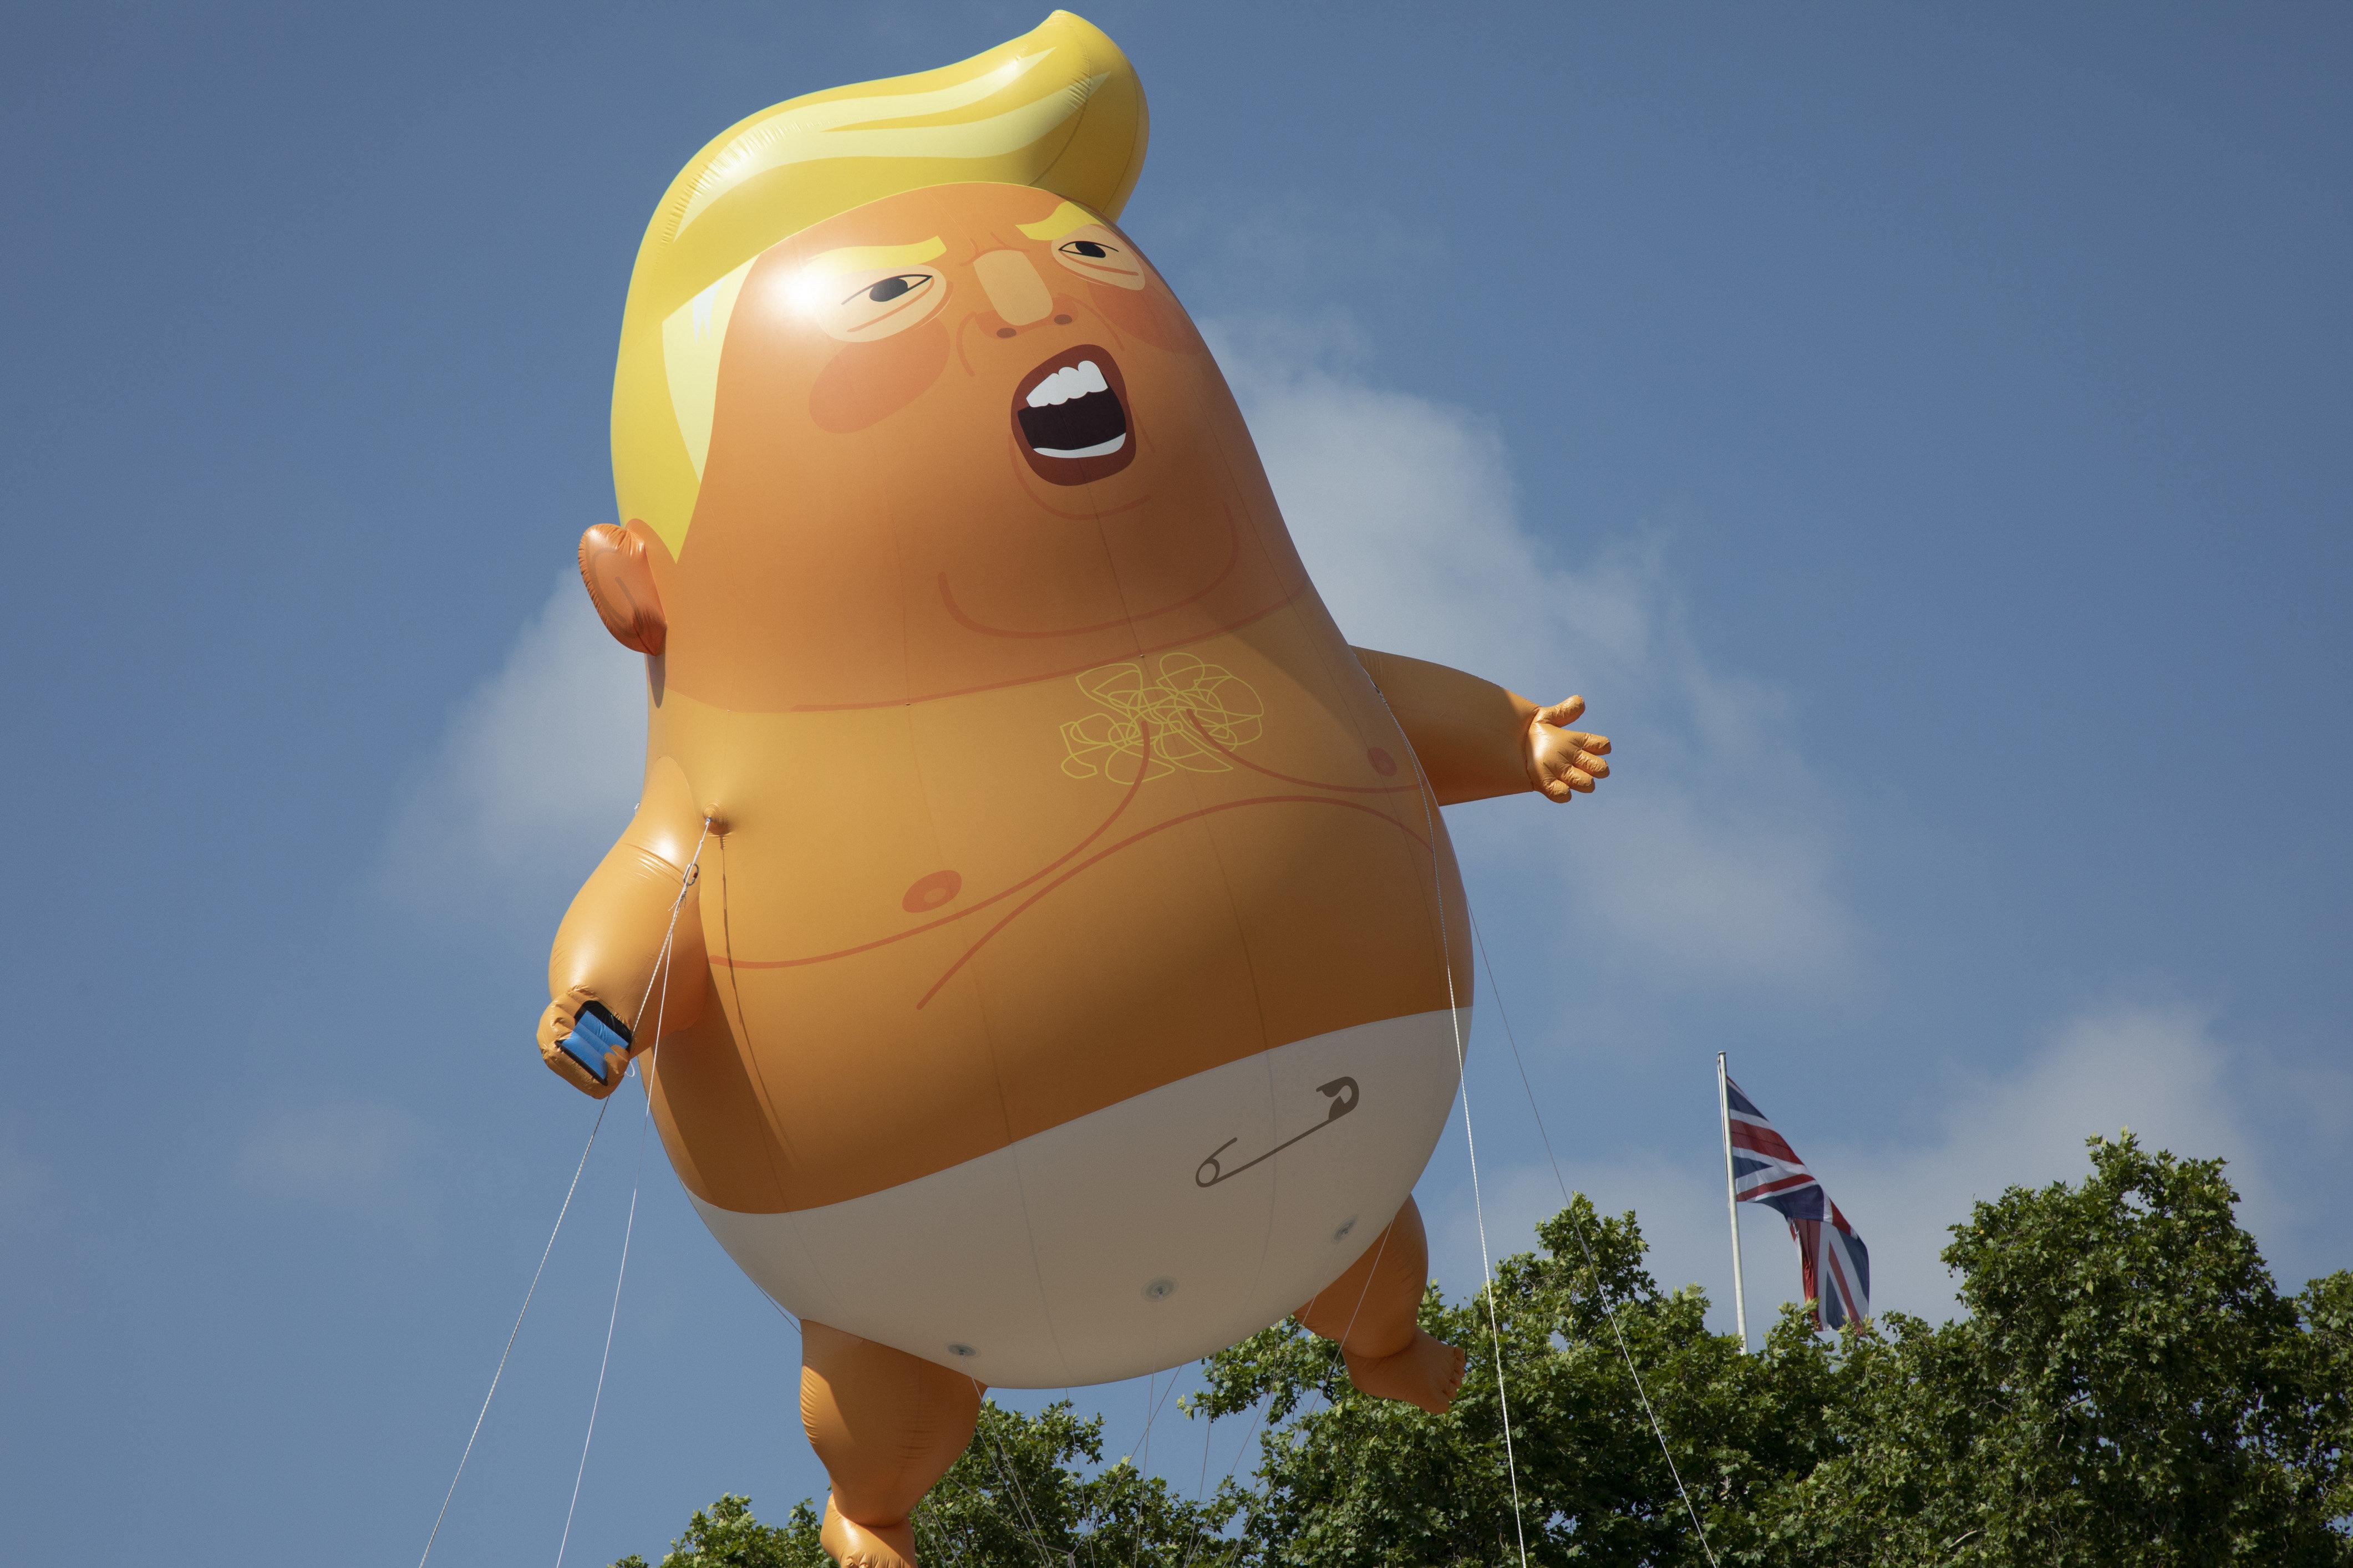 huffingtonpost.com - Mary Papenfuss - Baby Trump Blimp Highlights Puerto Rico Rally Near Mar-a-Lago